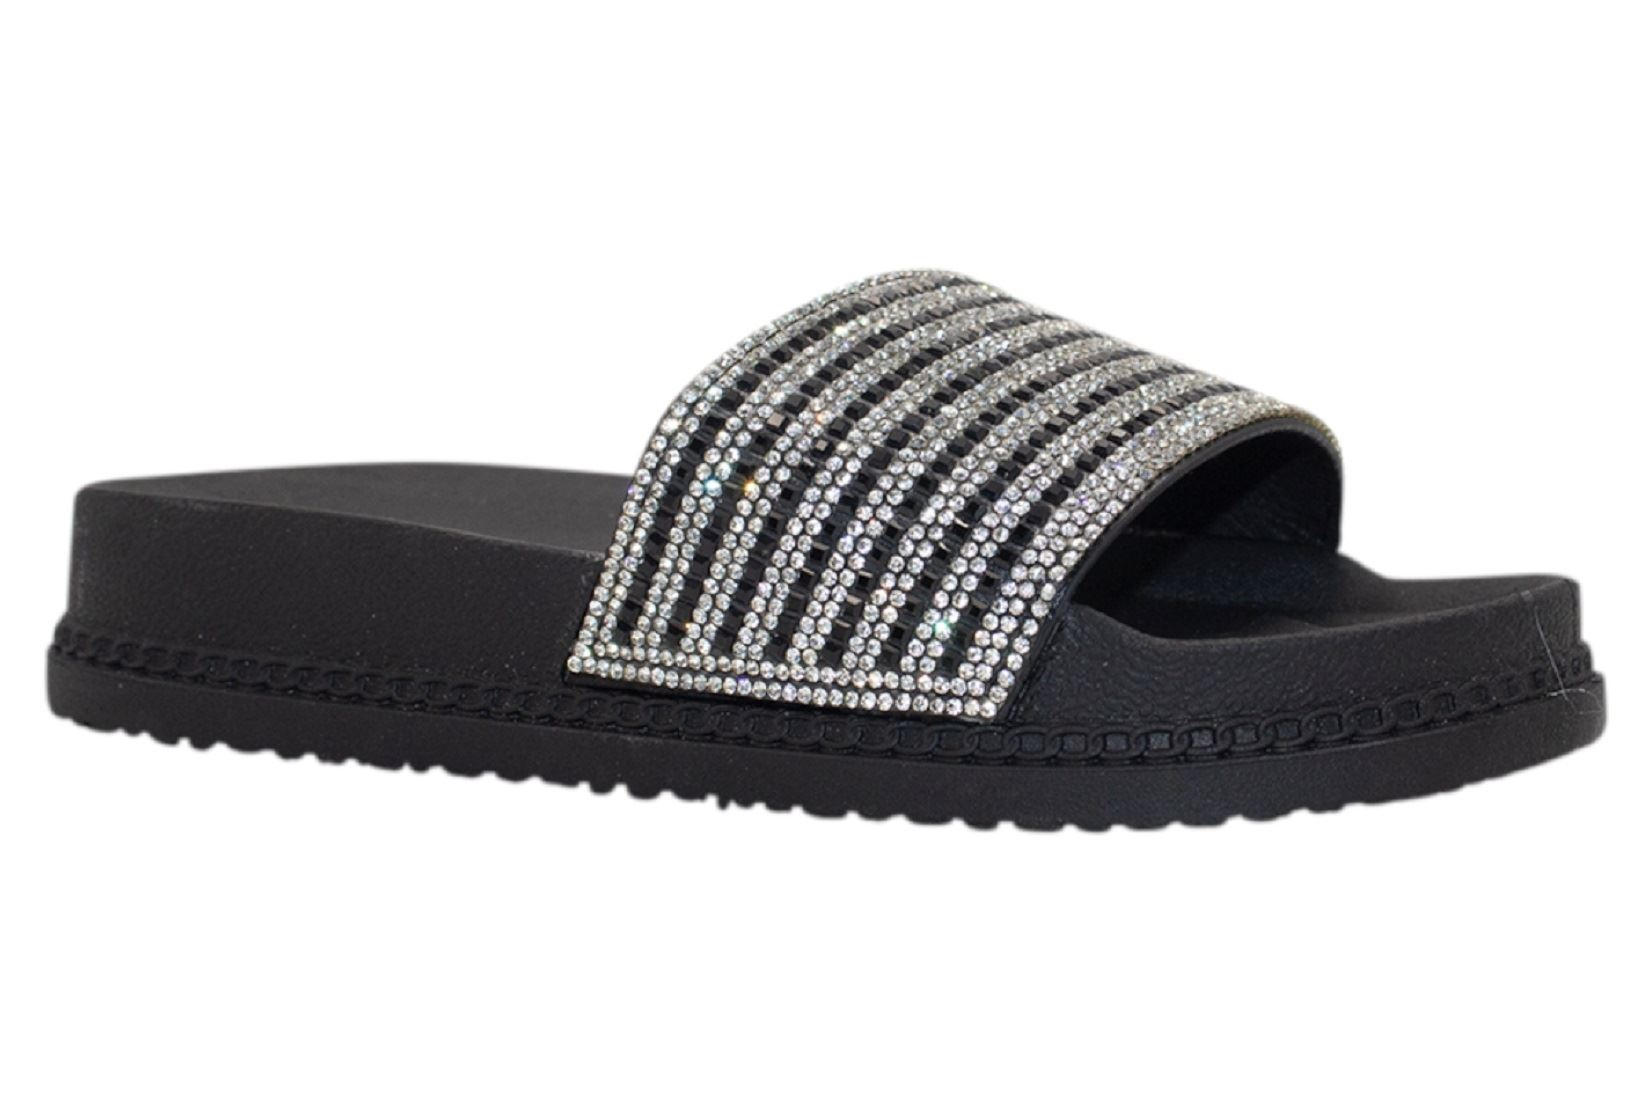 Womens-Sliders-Casual-Slippers-Mules-Ladies-Diamante-Flip-Flop-Sandals-Shoes thumbnail 89